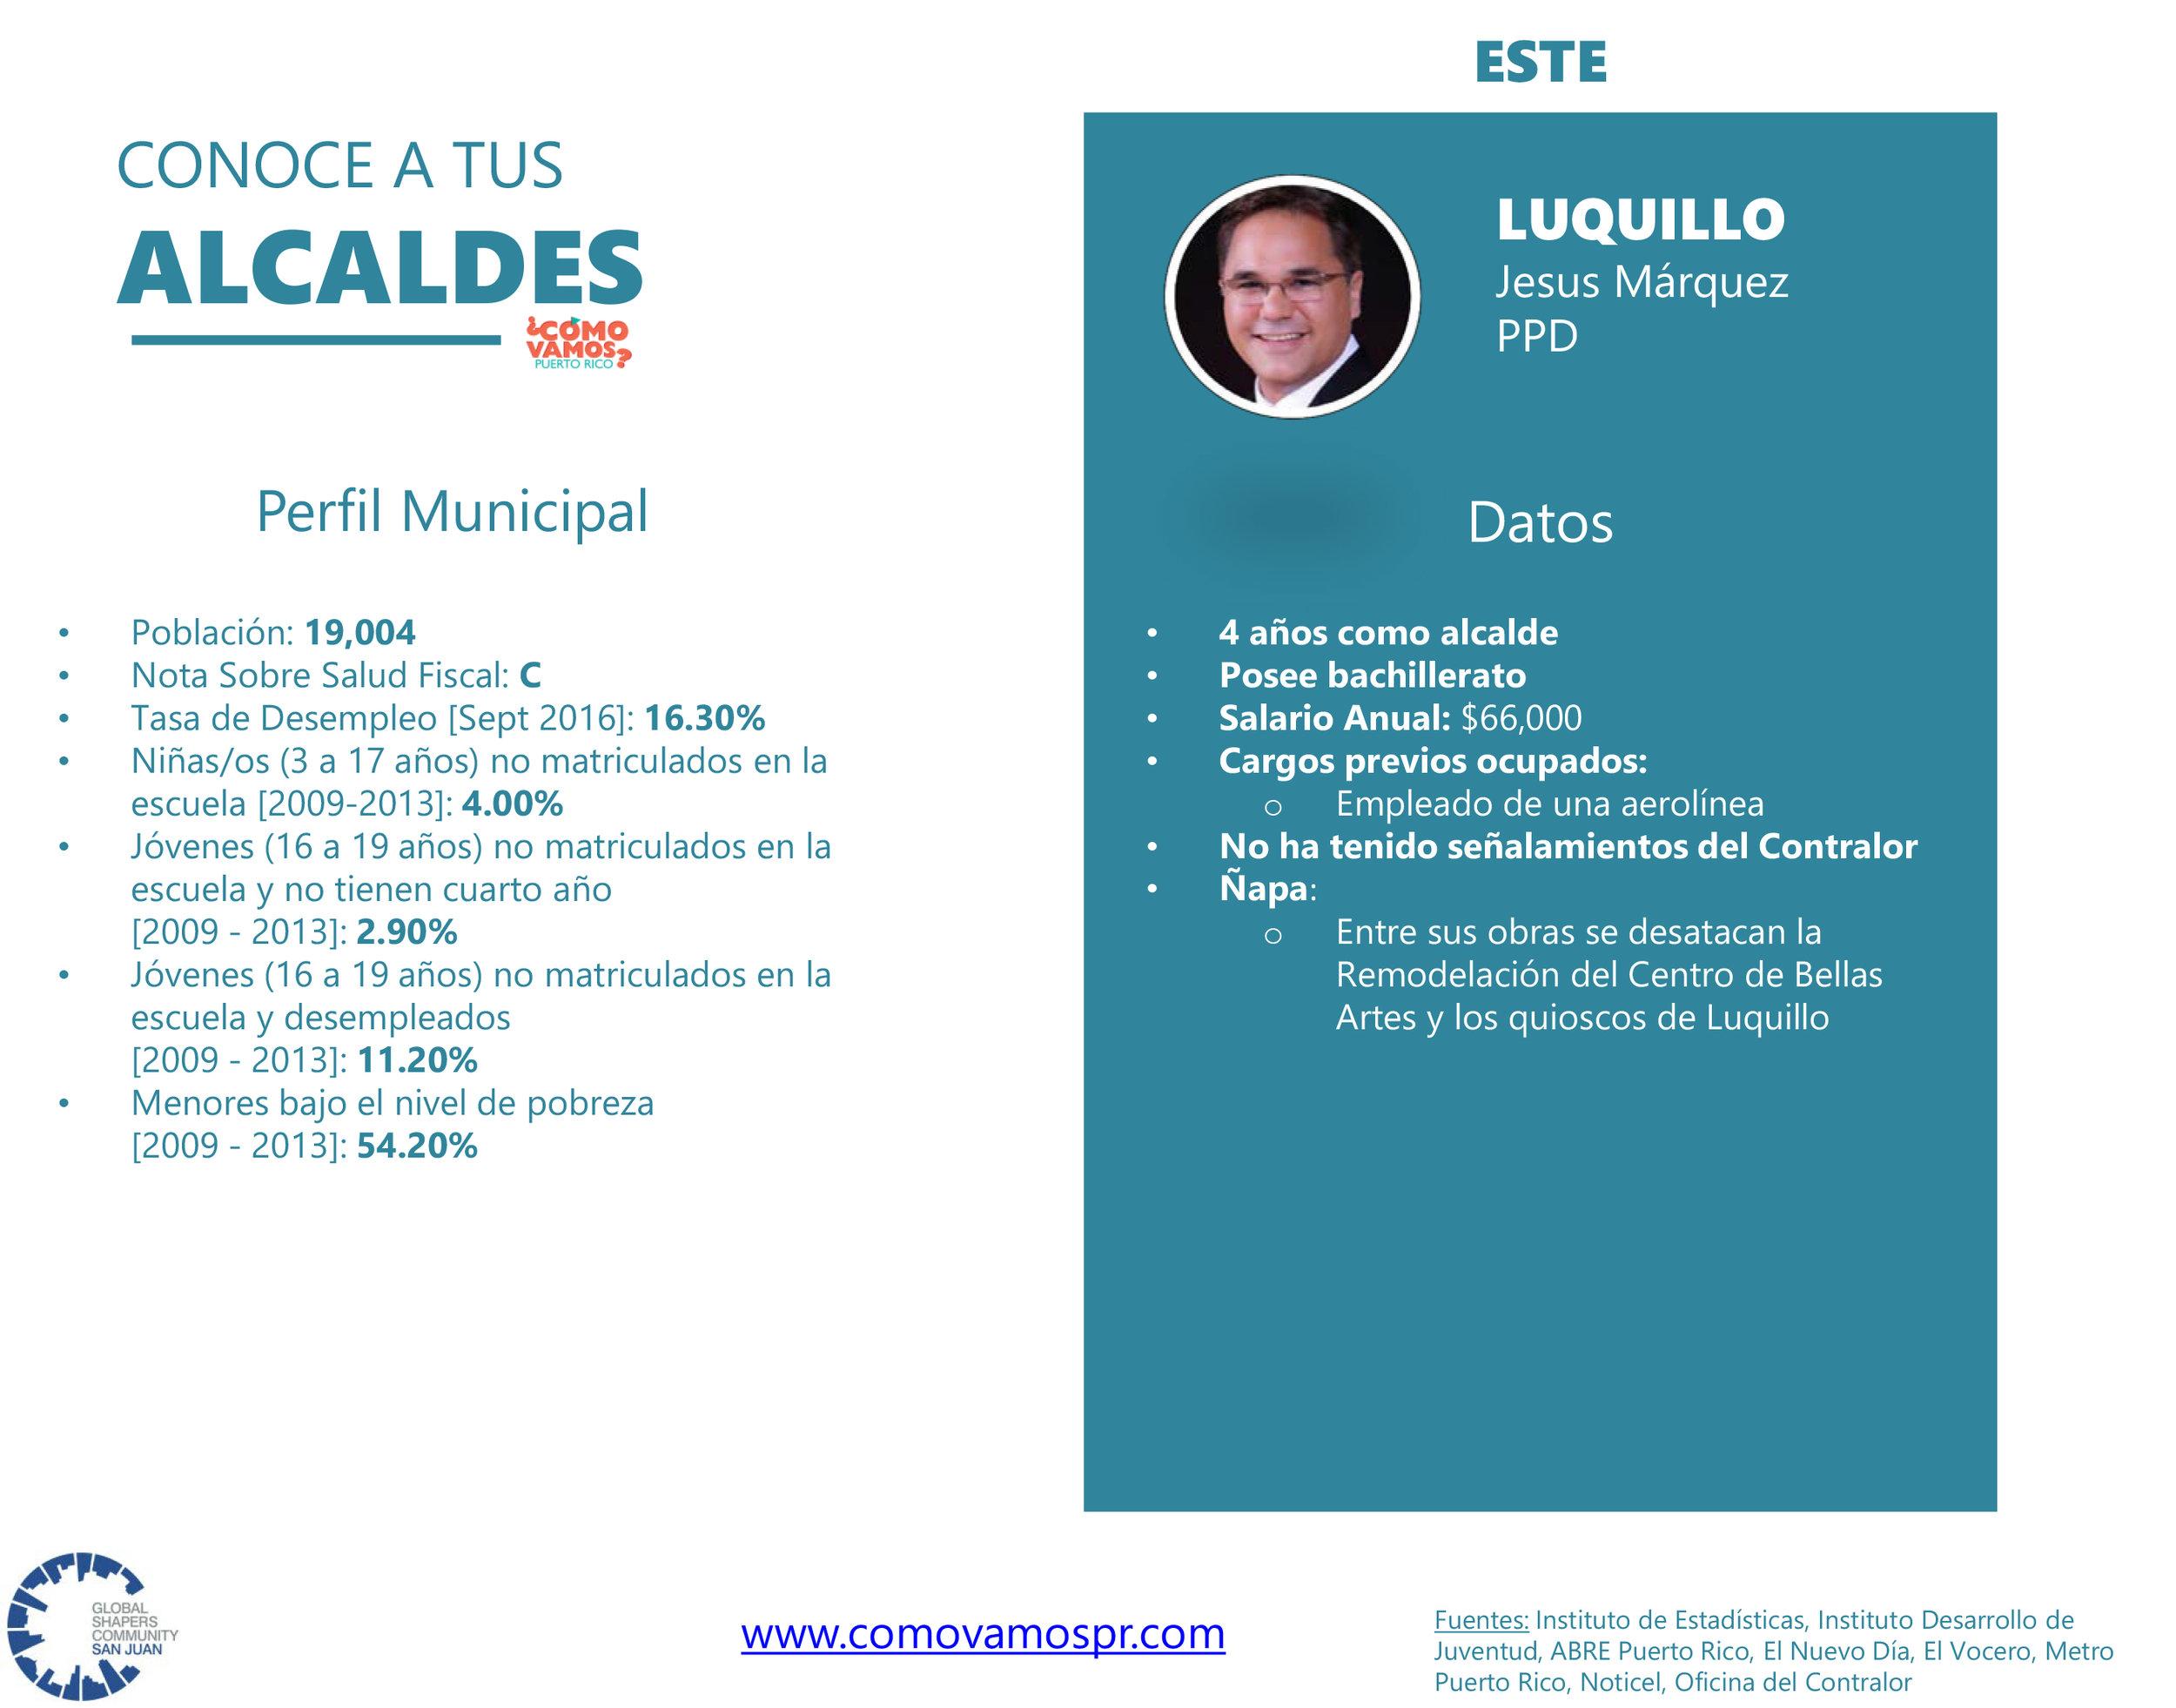 Alcaldes_Este_Luquillo.jpg